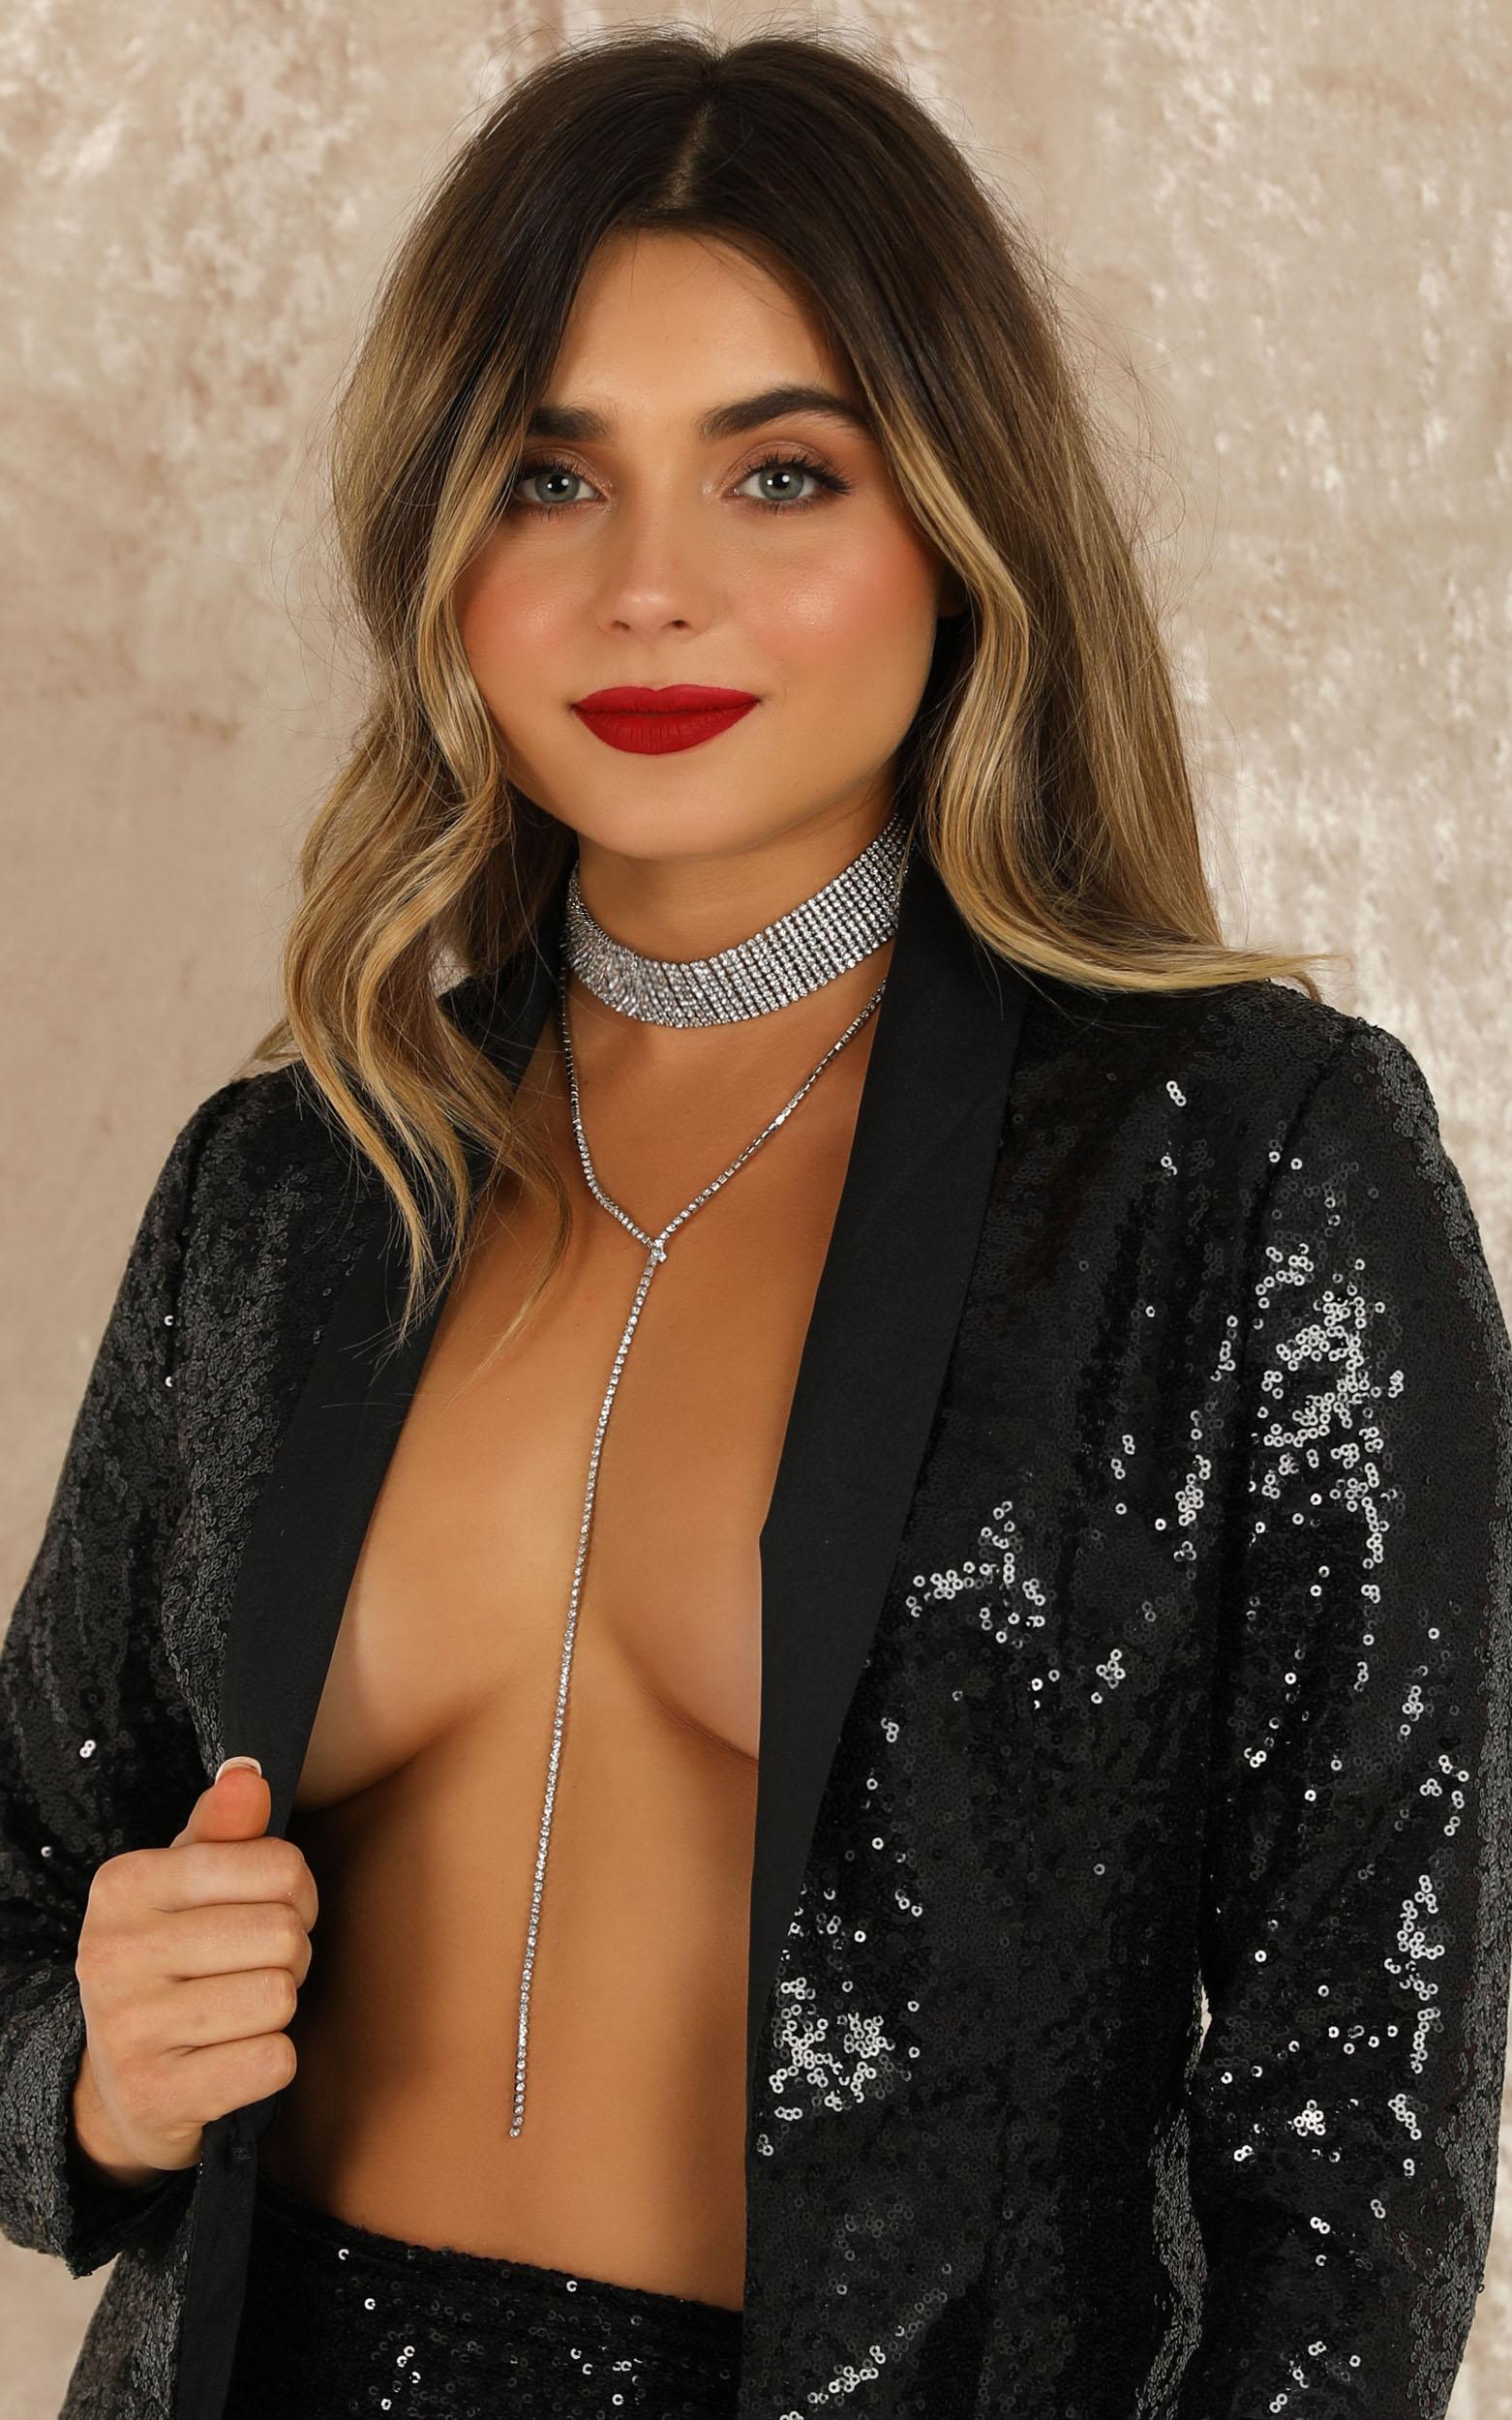 No More Lies Necklace In Silver Diamante, , hi-res image number null